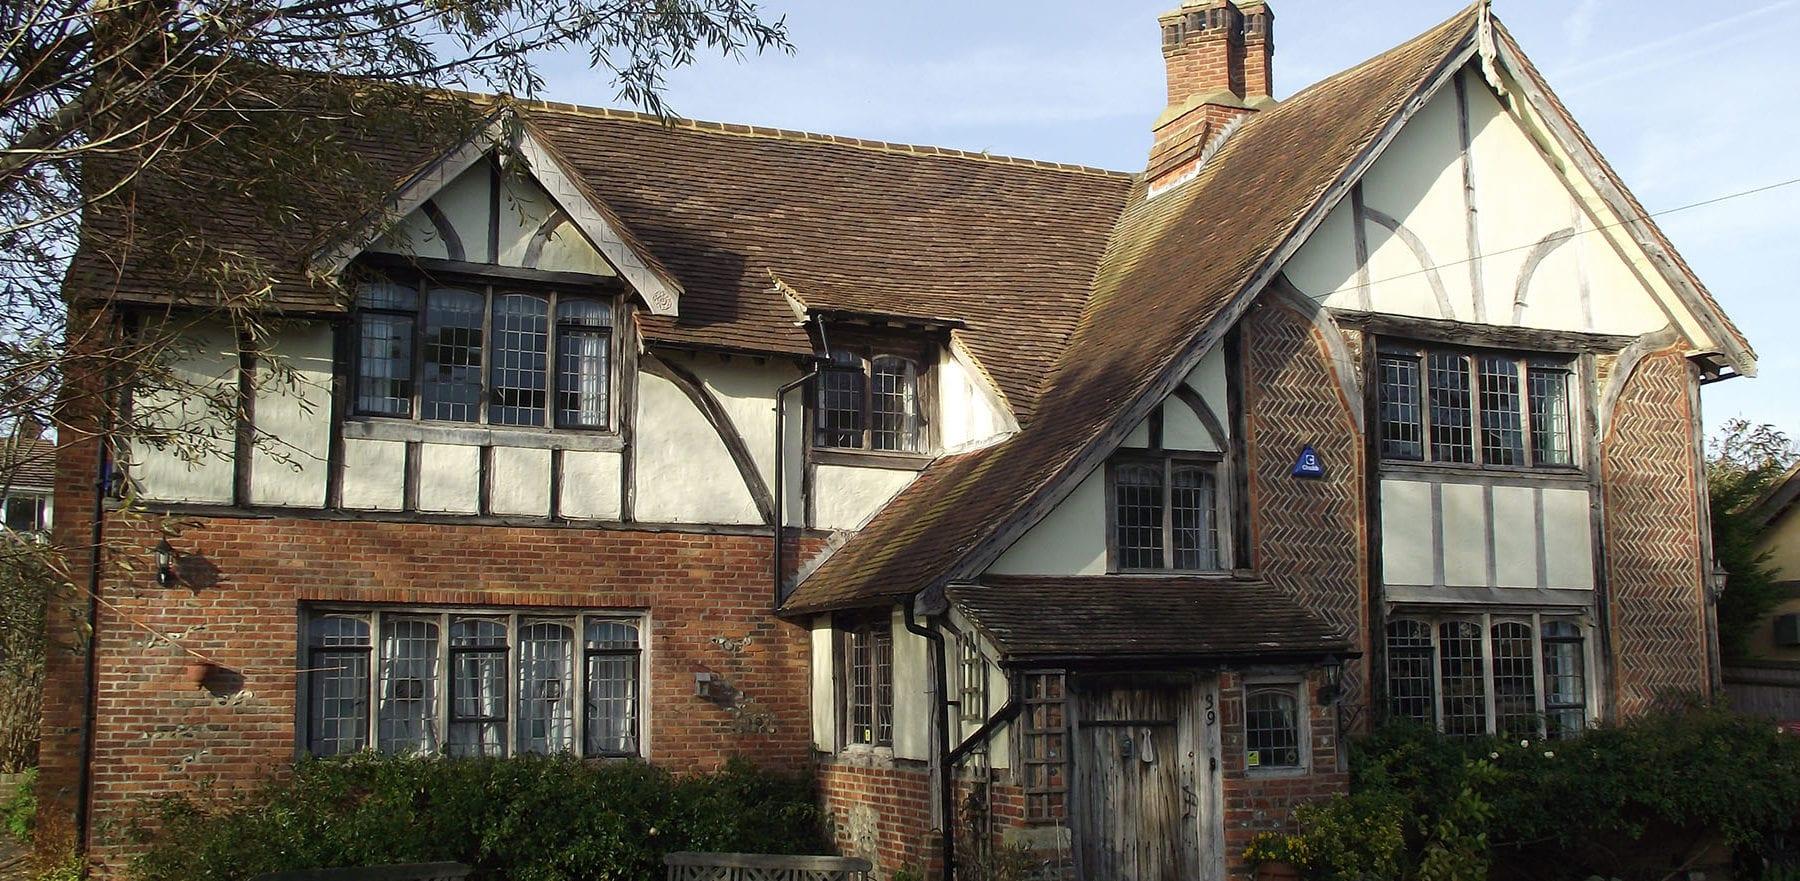 Lifestiles - Handmade Restoration Clay Roof Tiles - Brighton, England 2